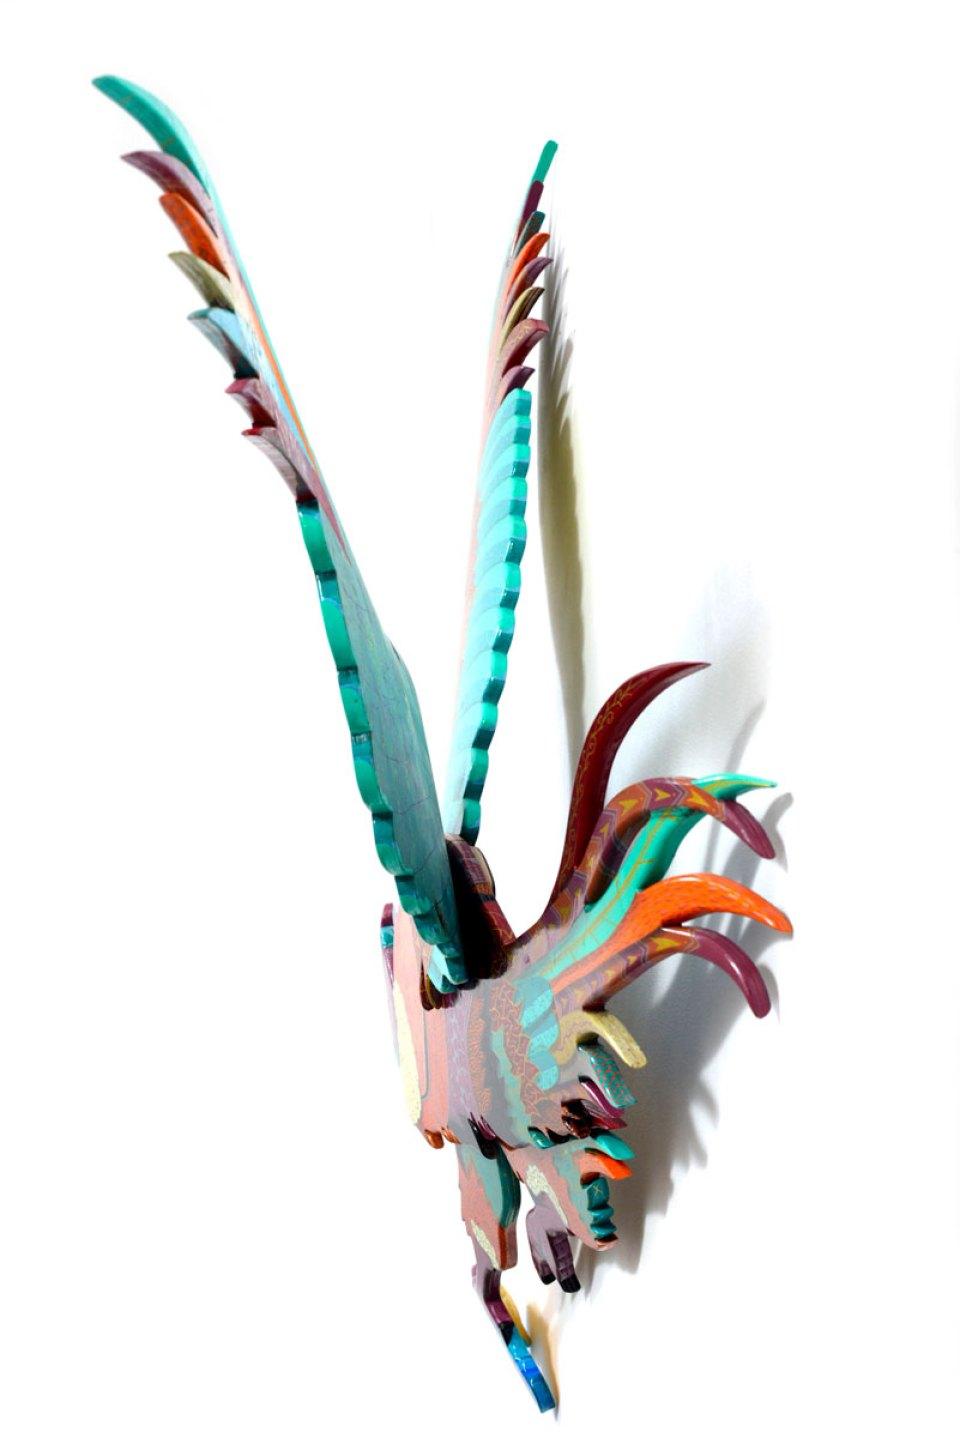 Condor Cleaner Sculpture En Skate Par Julien Deniau 4